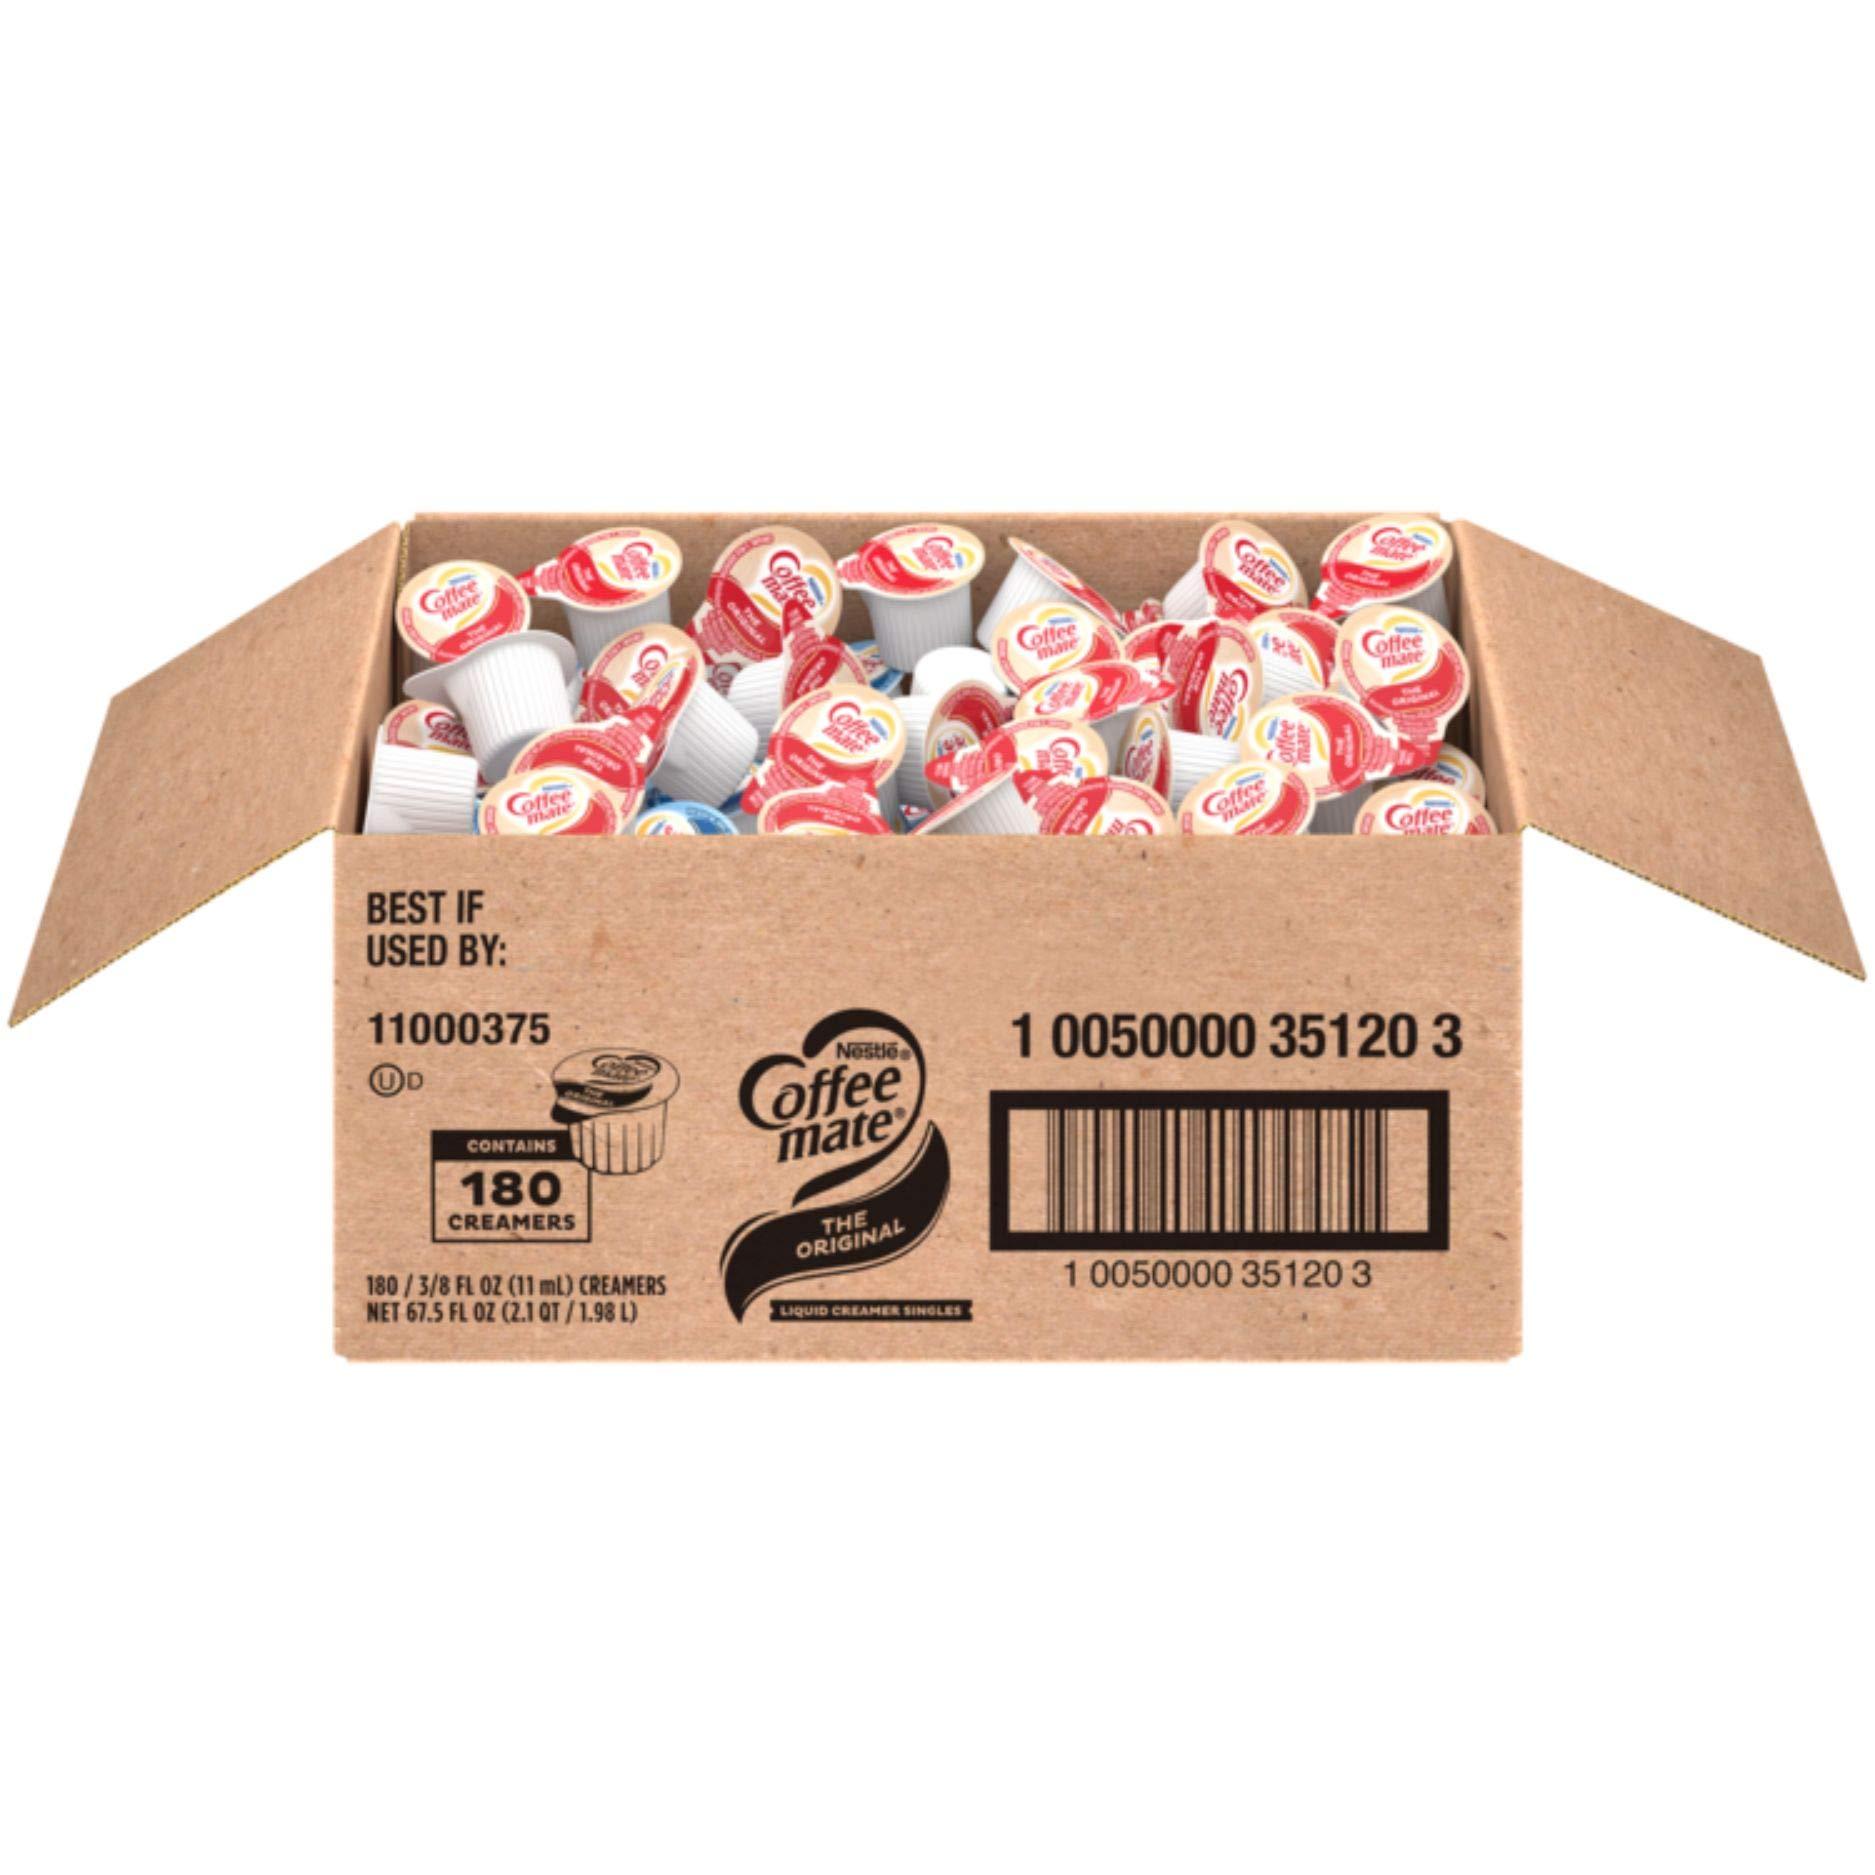 Nestle Coffee mate Coffee Creamer, Original, Liquid Creamer Singles, Non Dairy, No Refrigeration, Box of 180